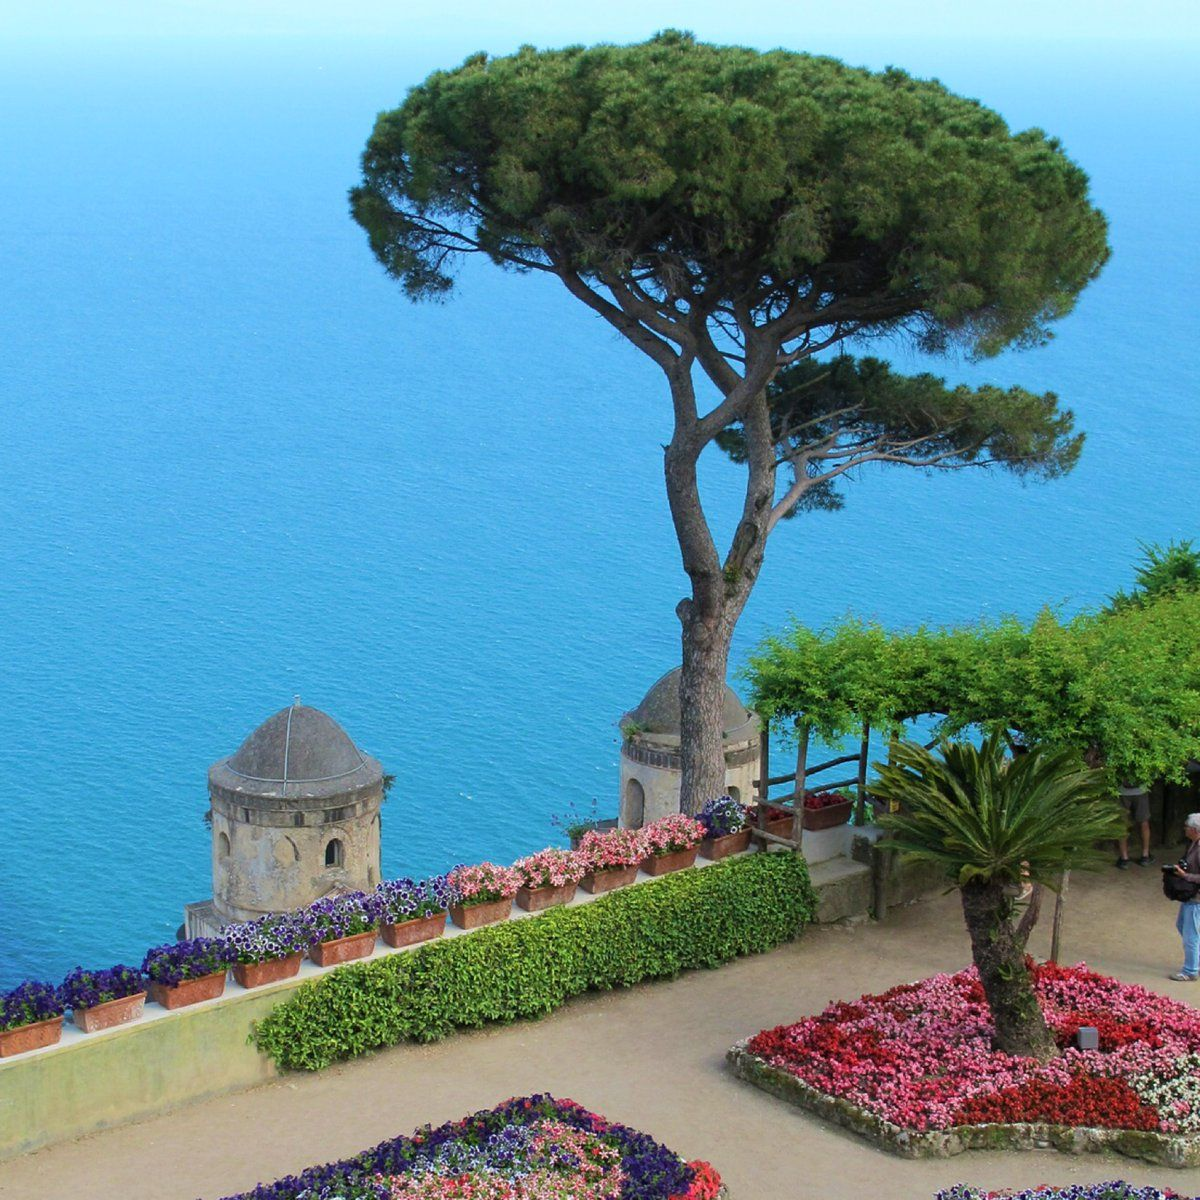 Capri - Italy 💖💖💖 Credits @timothysykes follow him for ... |Capri Italy Golf